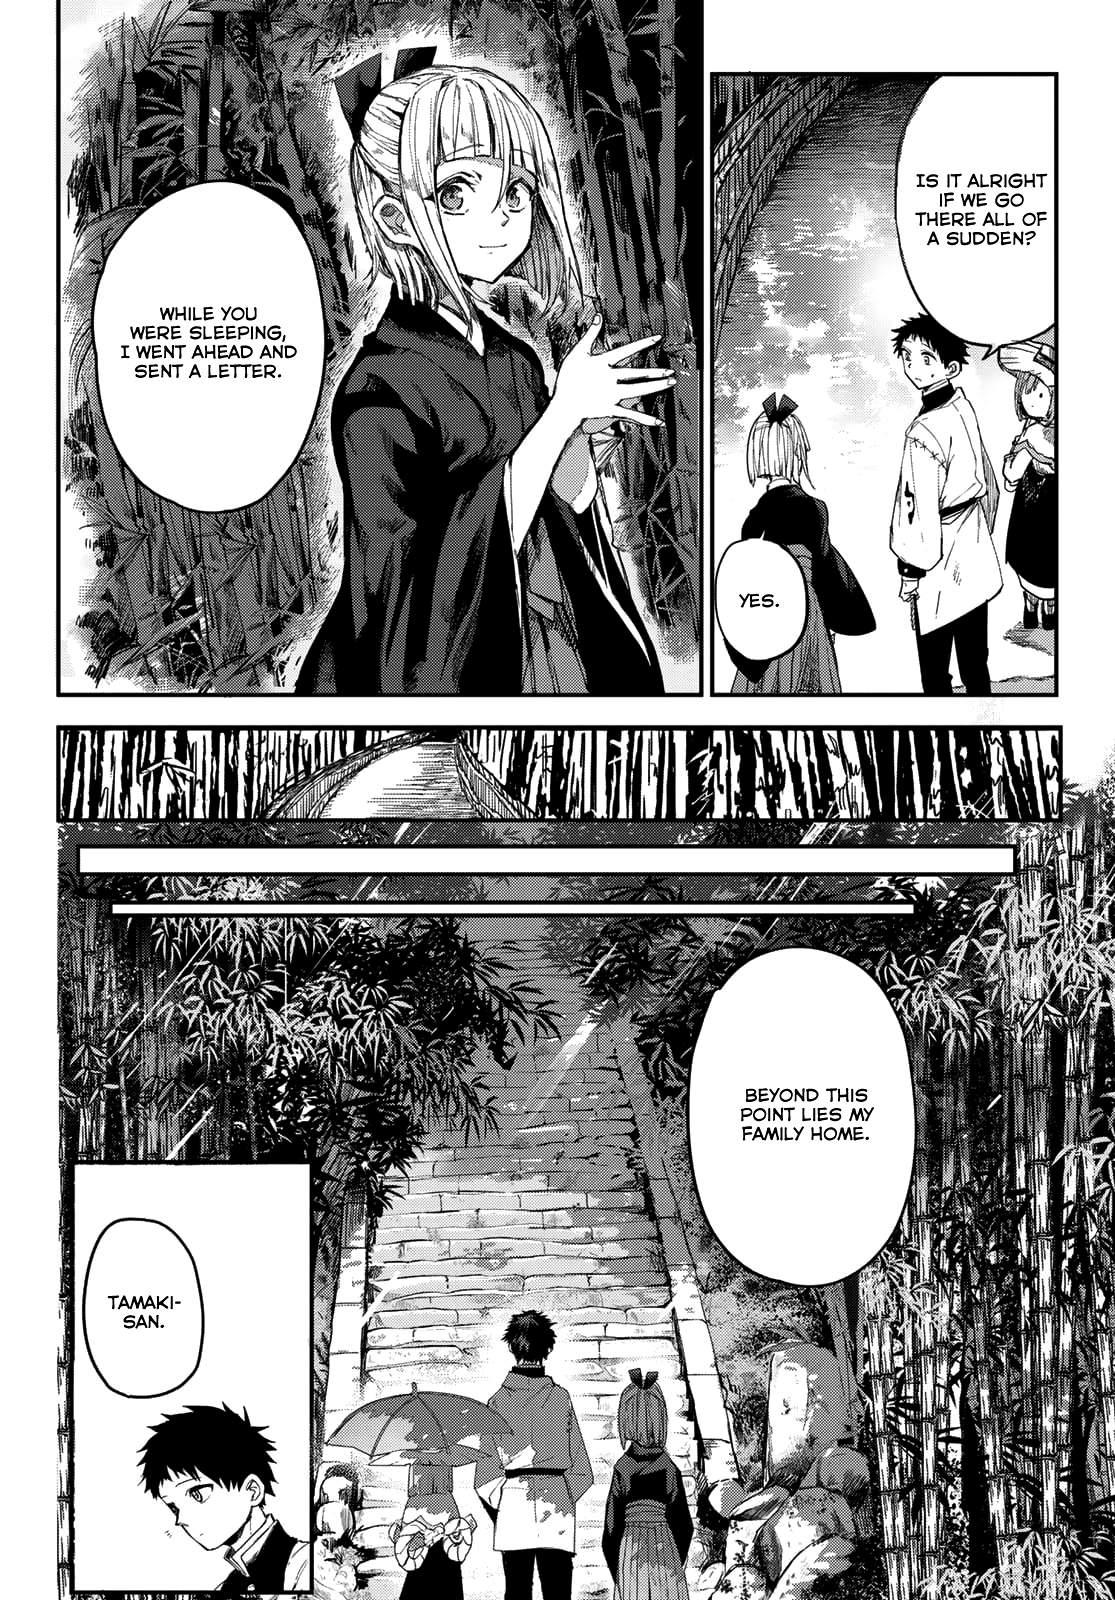 Kyuuki no Adabana - chapter 2-eng-li